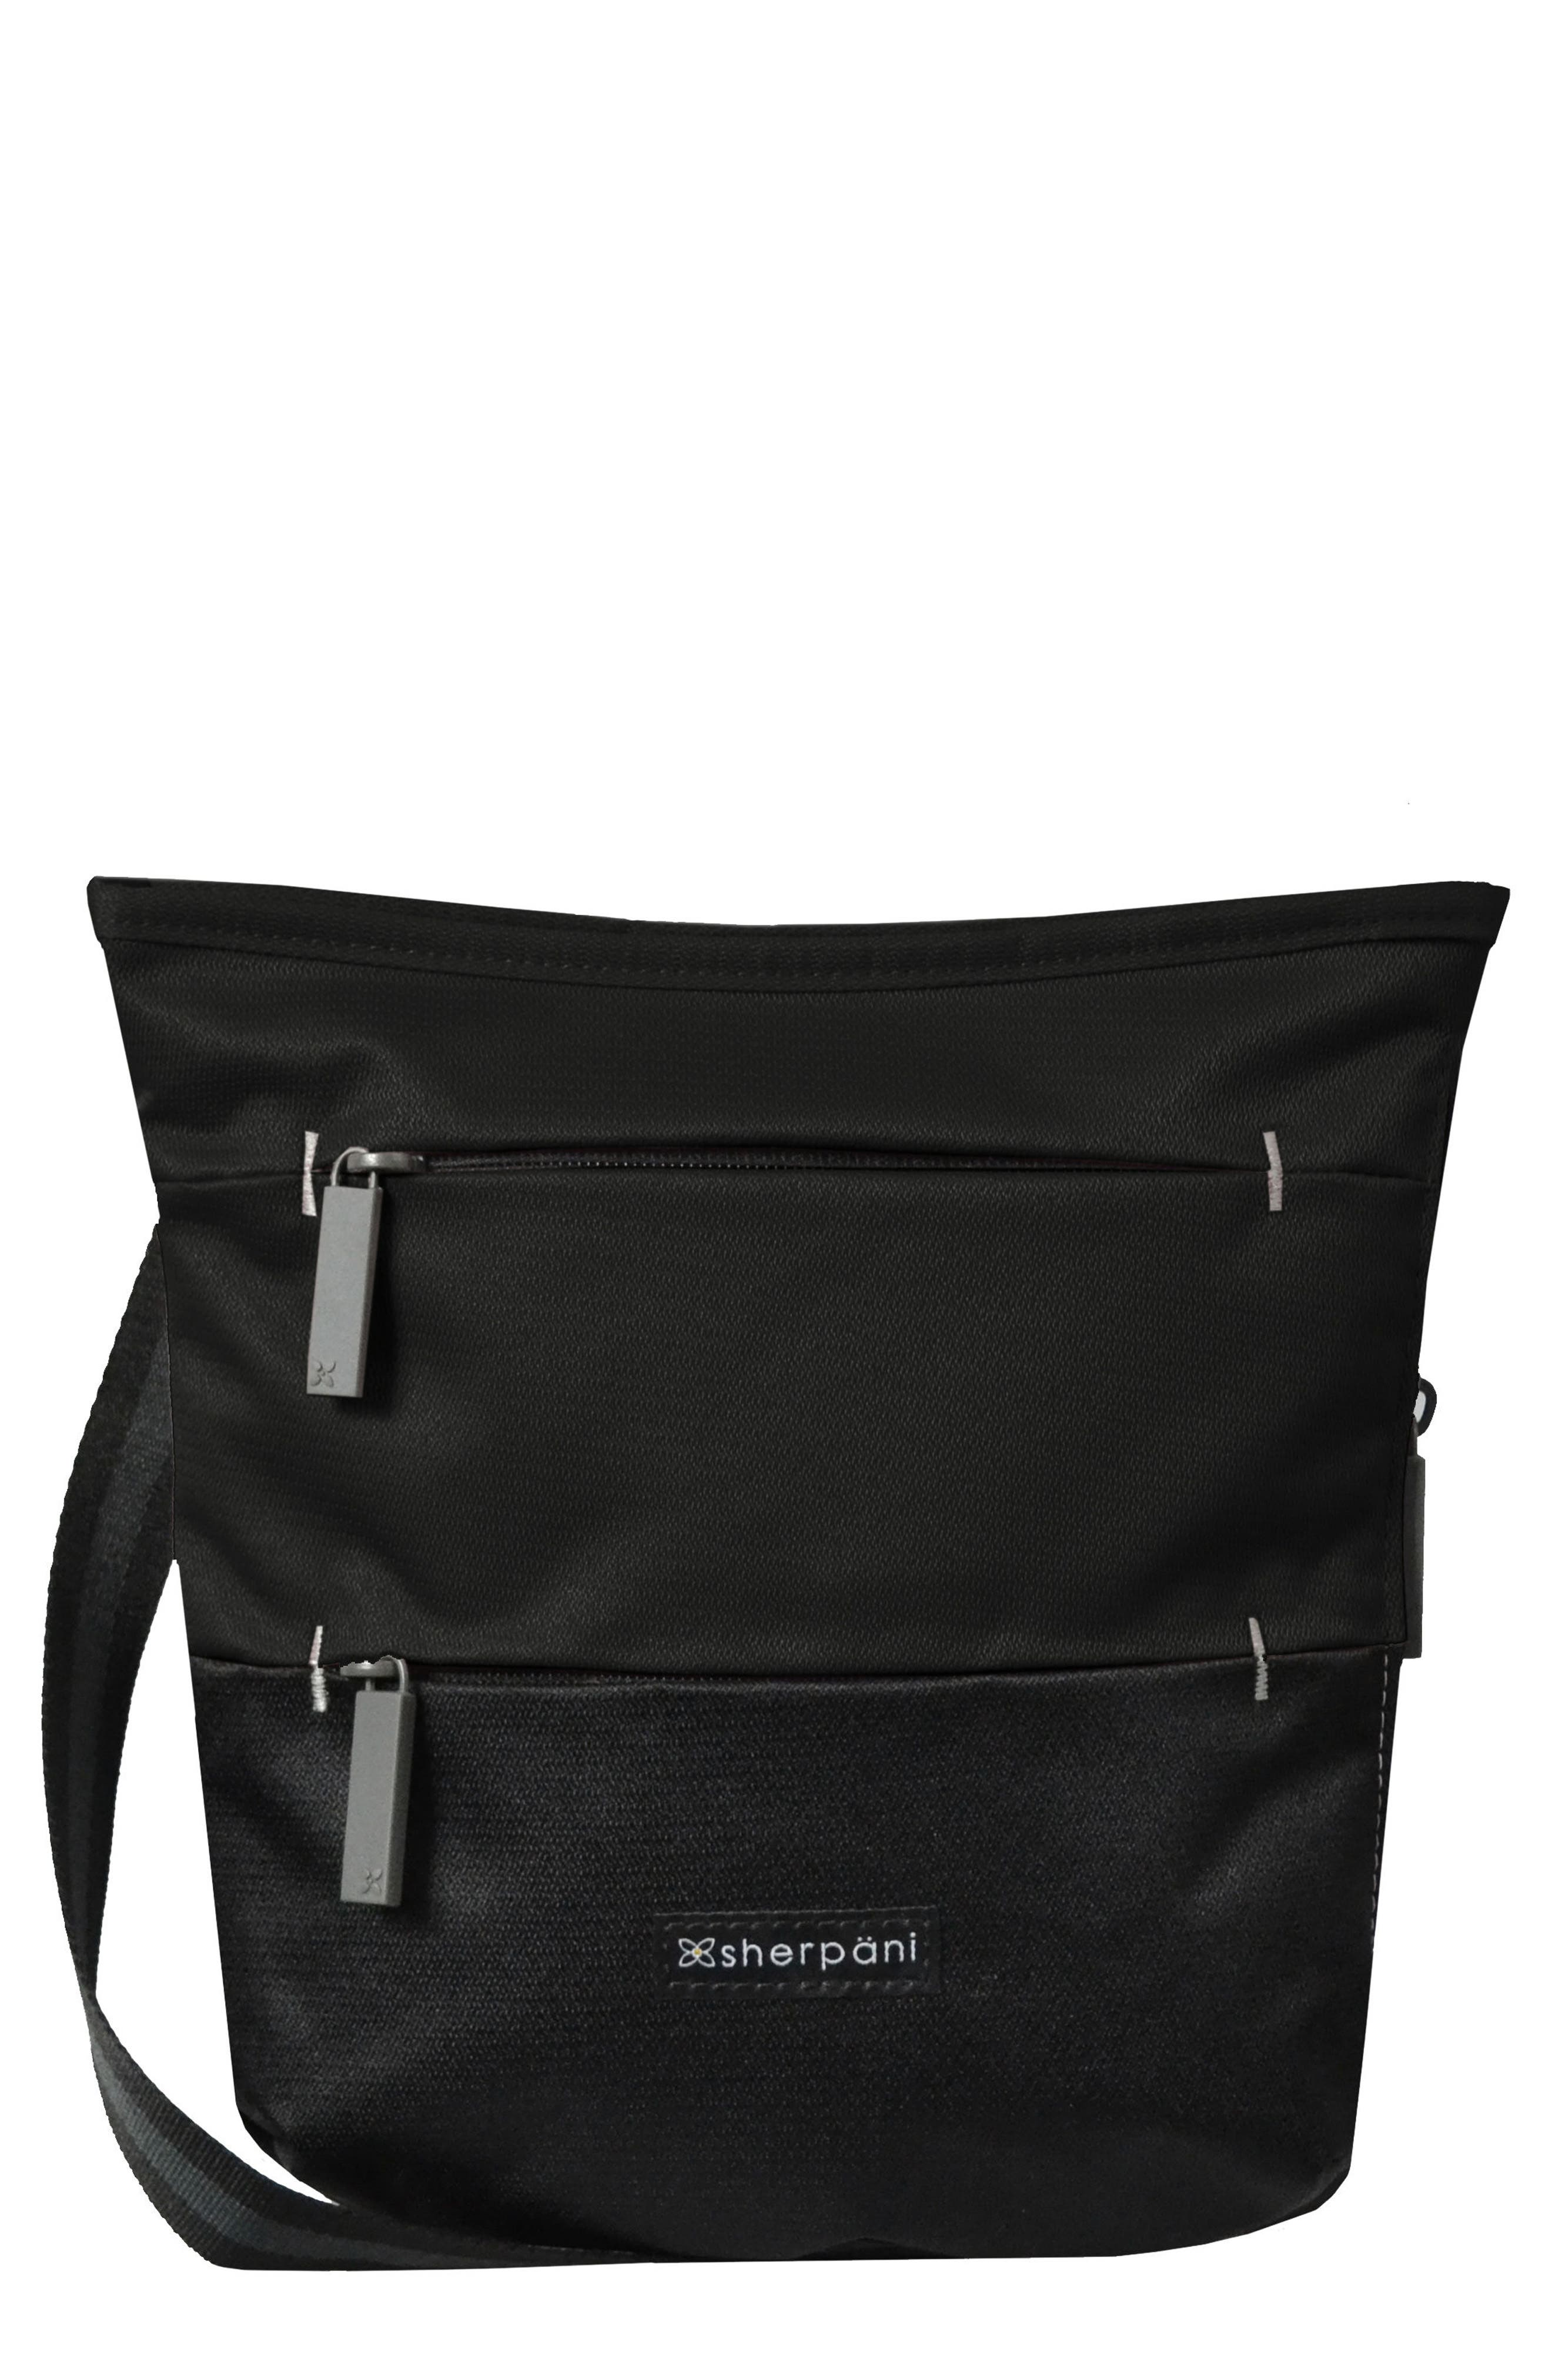 3d9289e84631 Sherpani Handbags   Wallets for Women